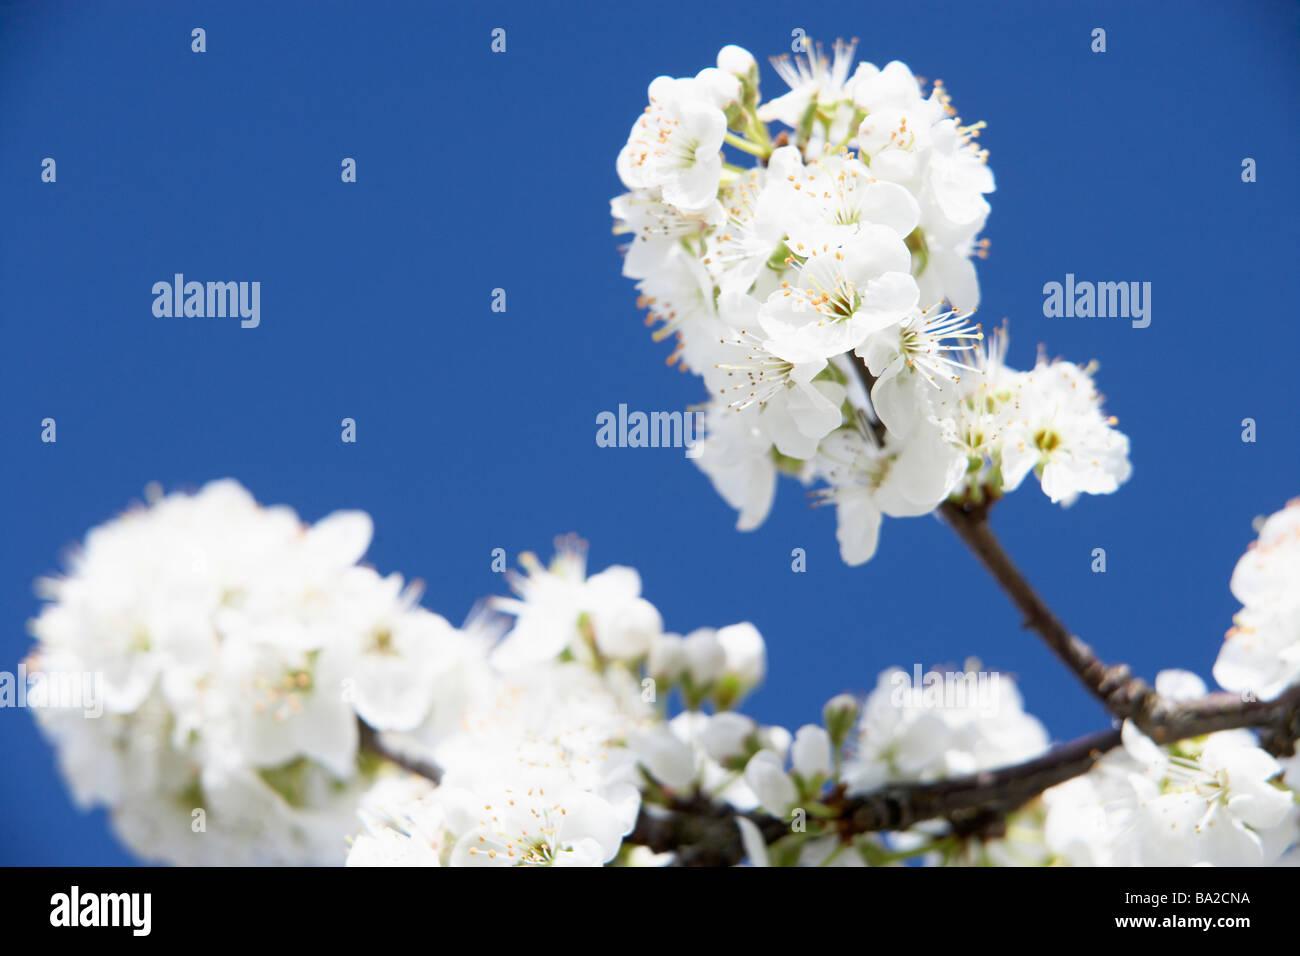 Apple Blossom Against Blu Sky Stock Photo